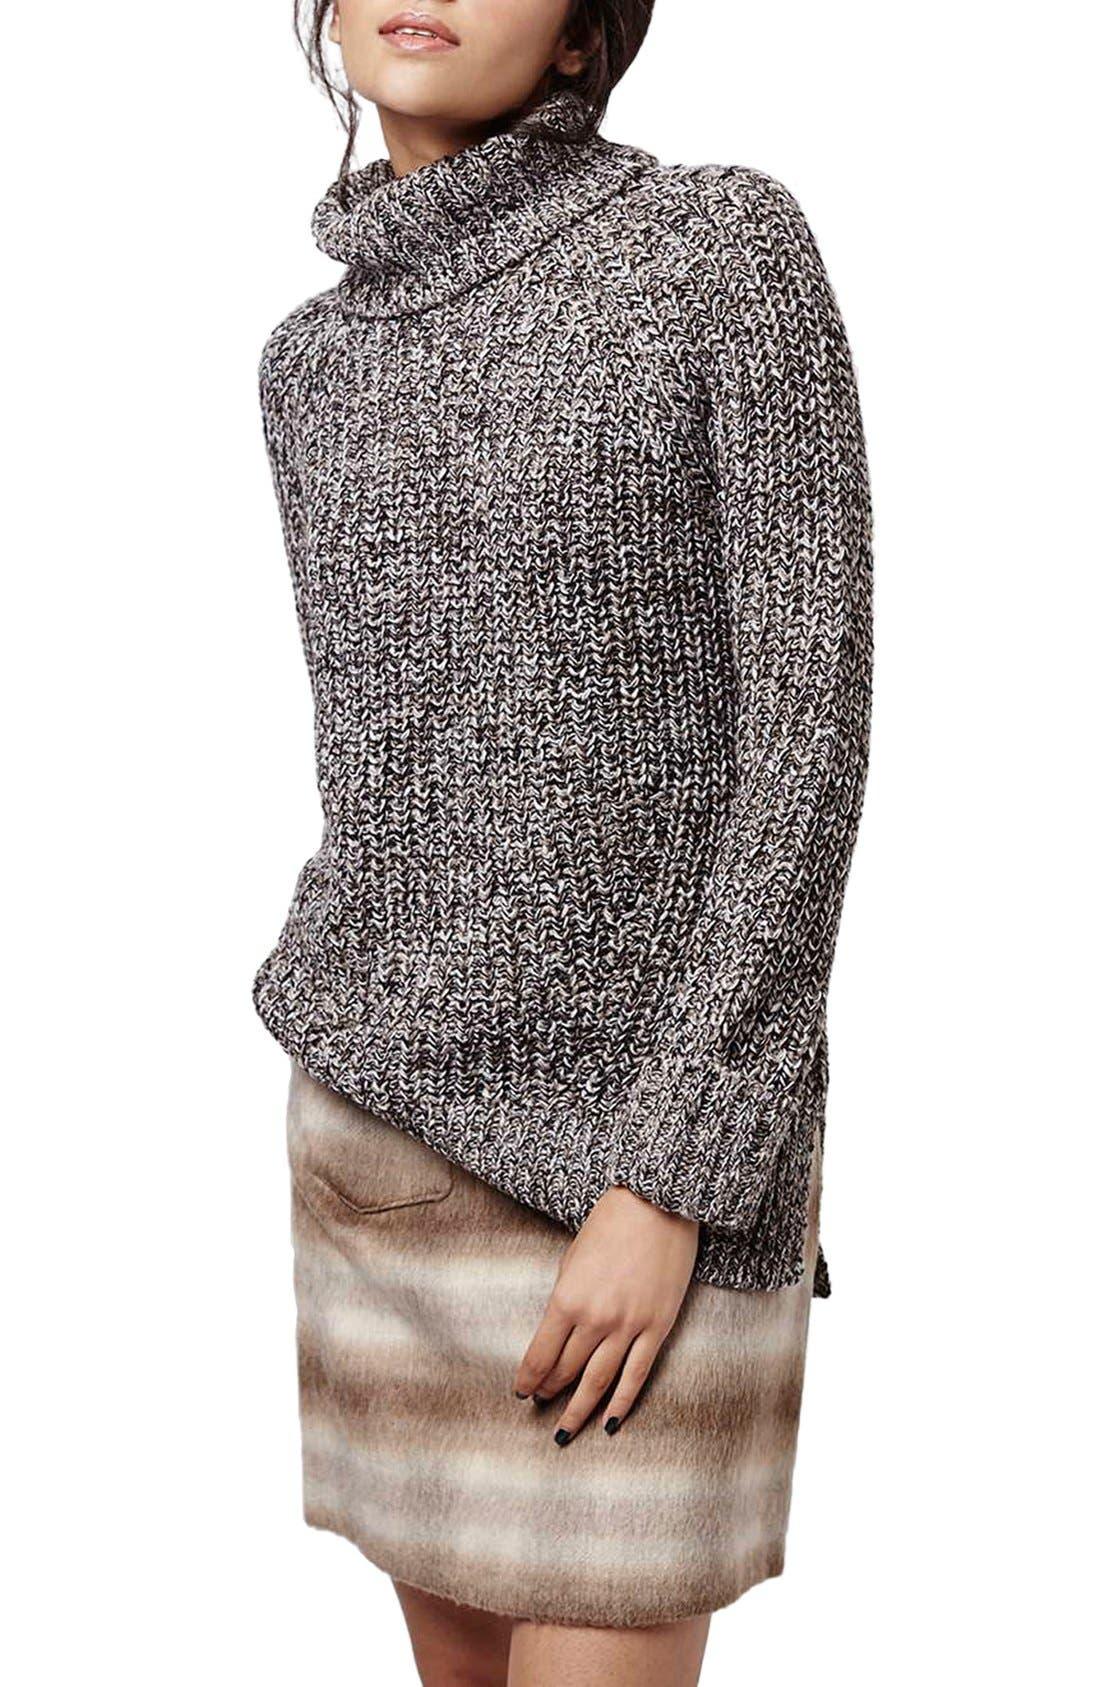 Alternate Image 1 Selected - Topshop Rolled Turtleneck Sweater